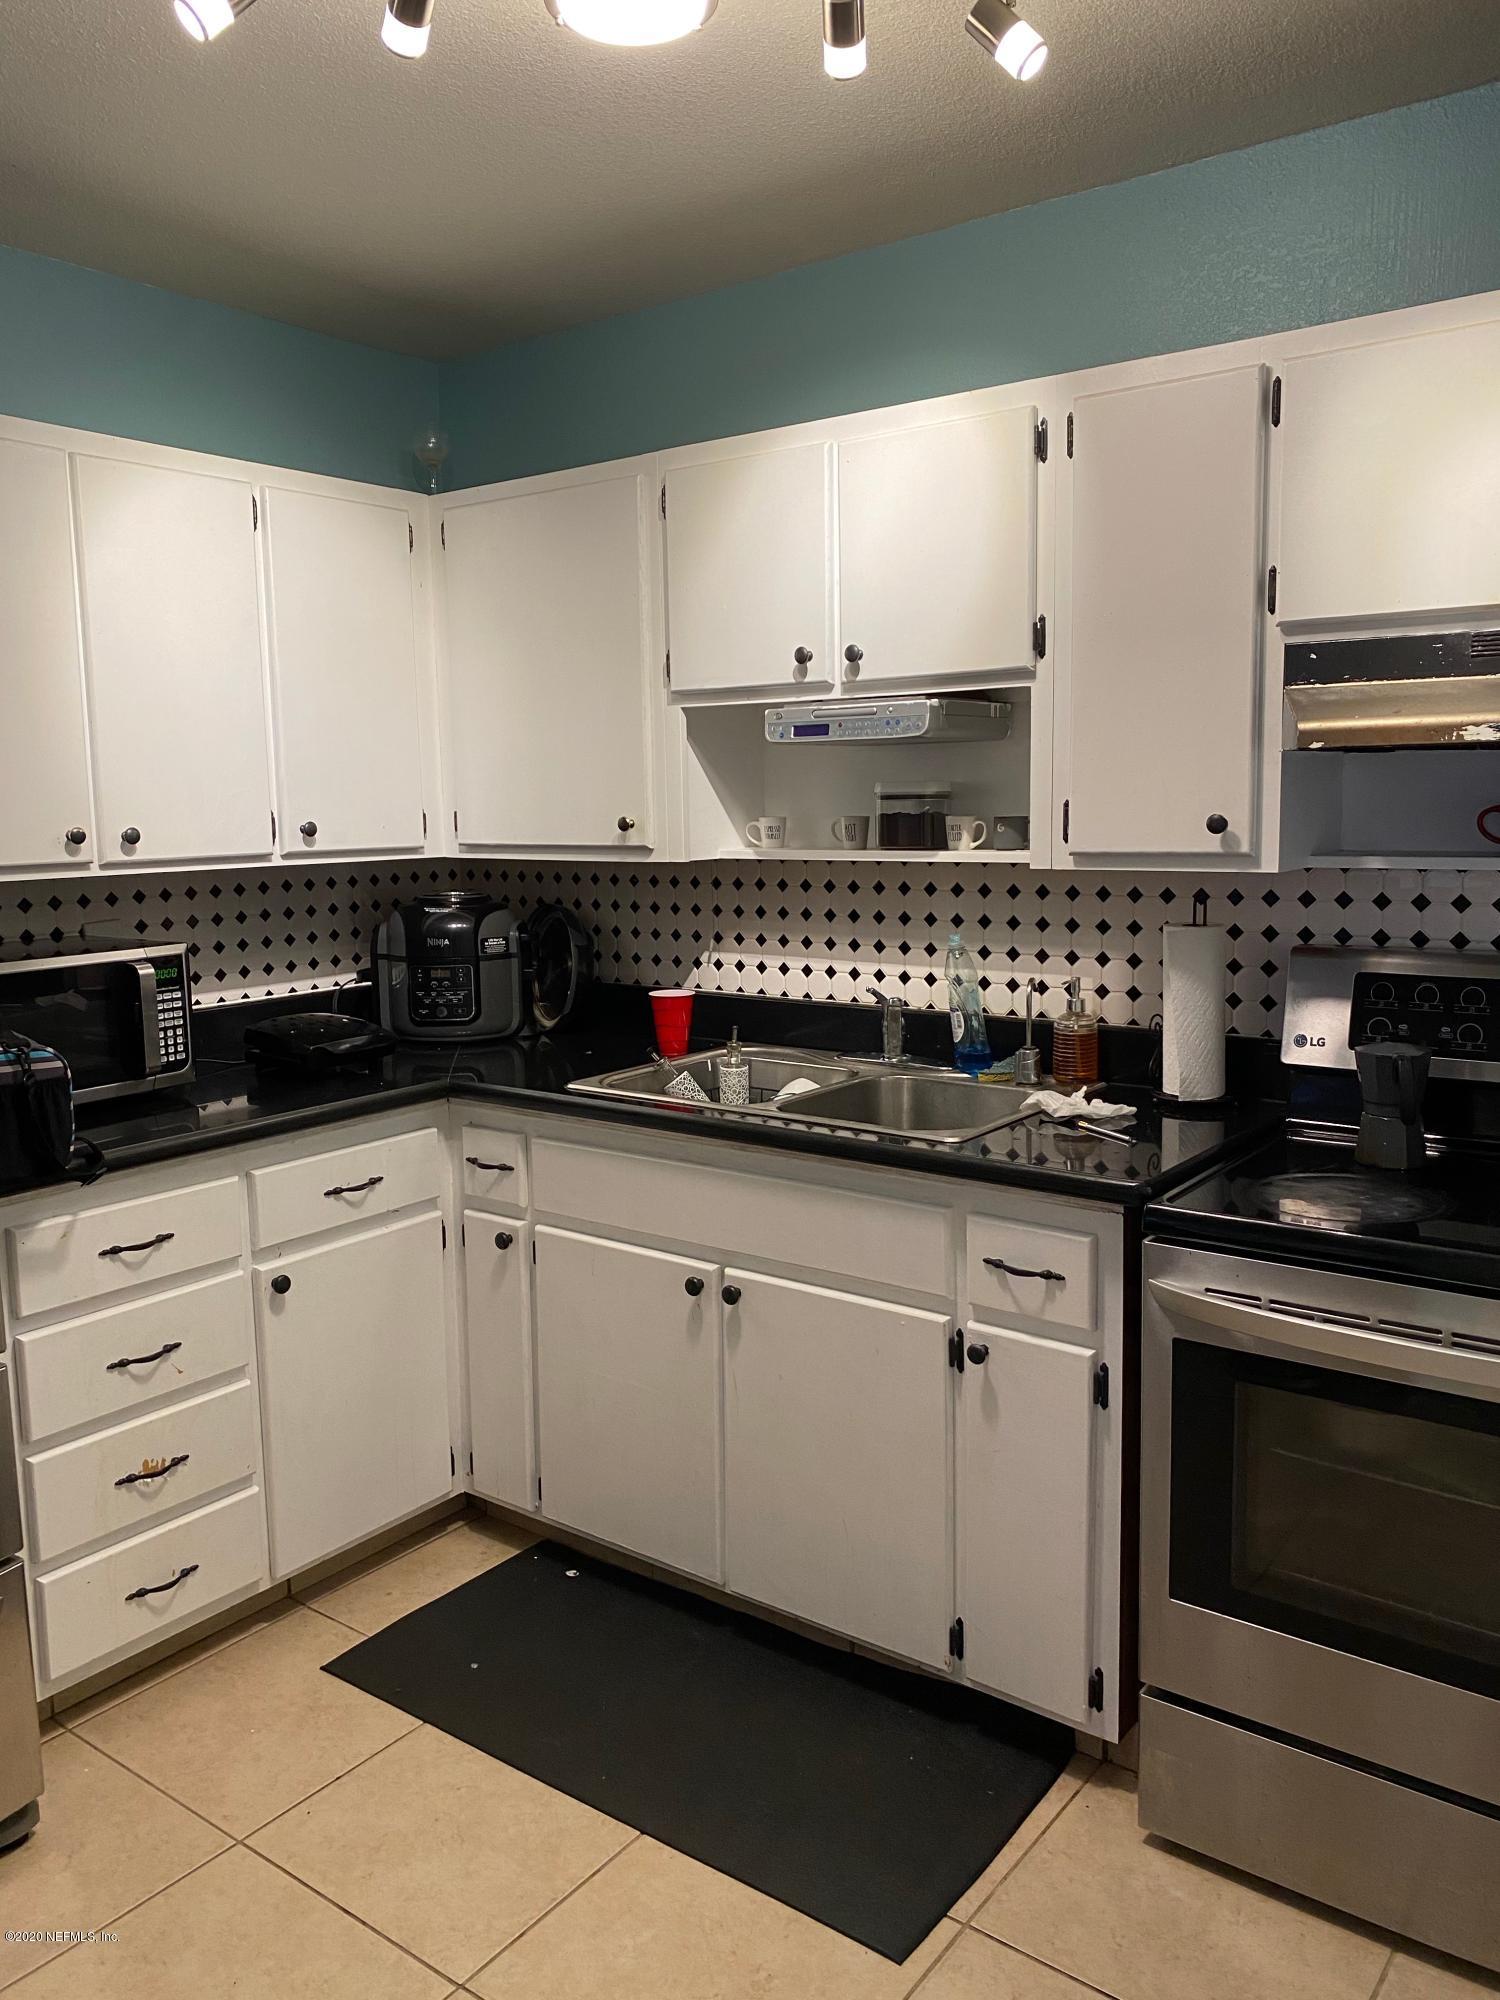 9211 FITZWALTER, JACKSONVILLE, FLORIDA 32208, 3 Bedrooms Bedrooms, ,2 BathroomsBathrooms,Residential,For sale,FITZWALTER,1083160